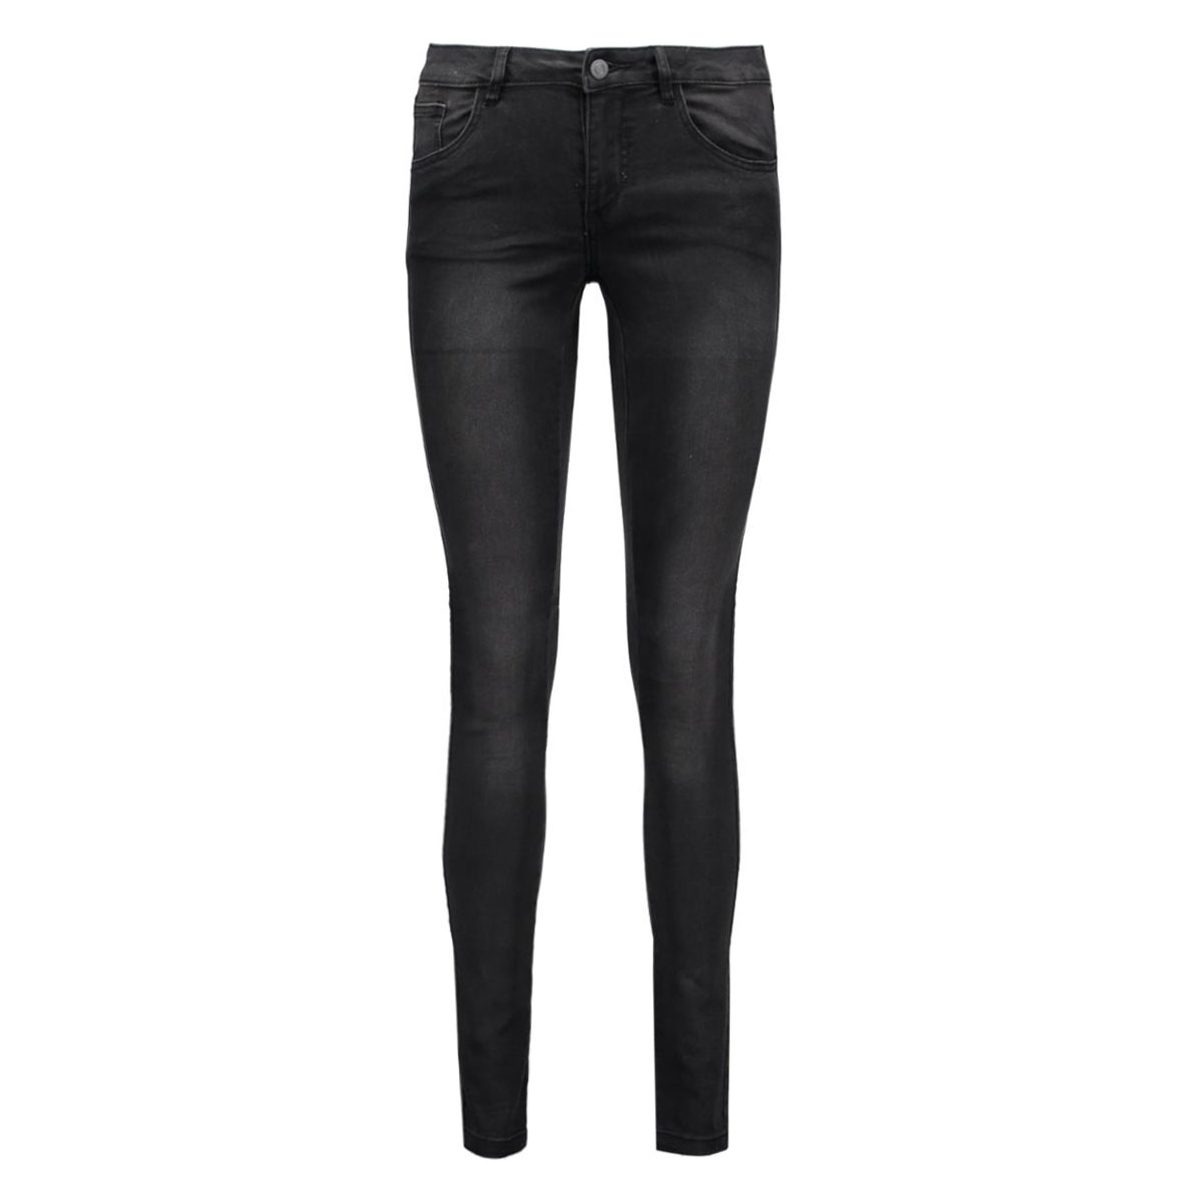 vicommit rw 5p hk0056 black-noos 14030398 vila jeans black